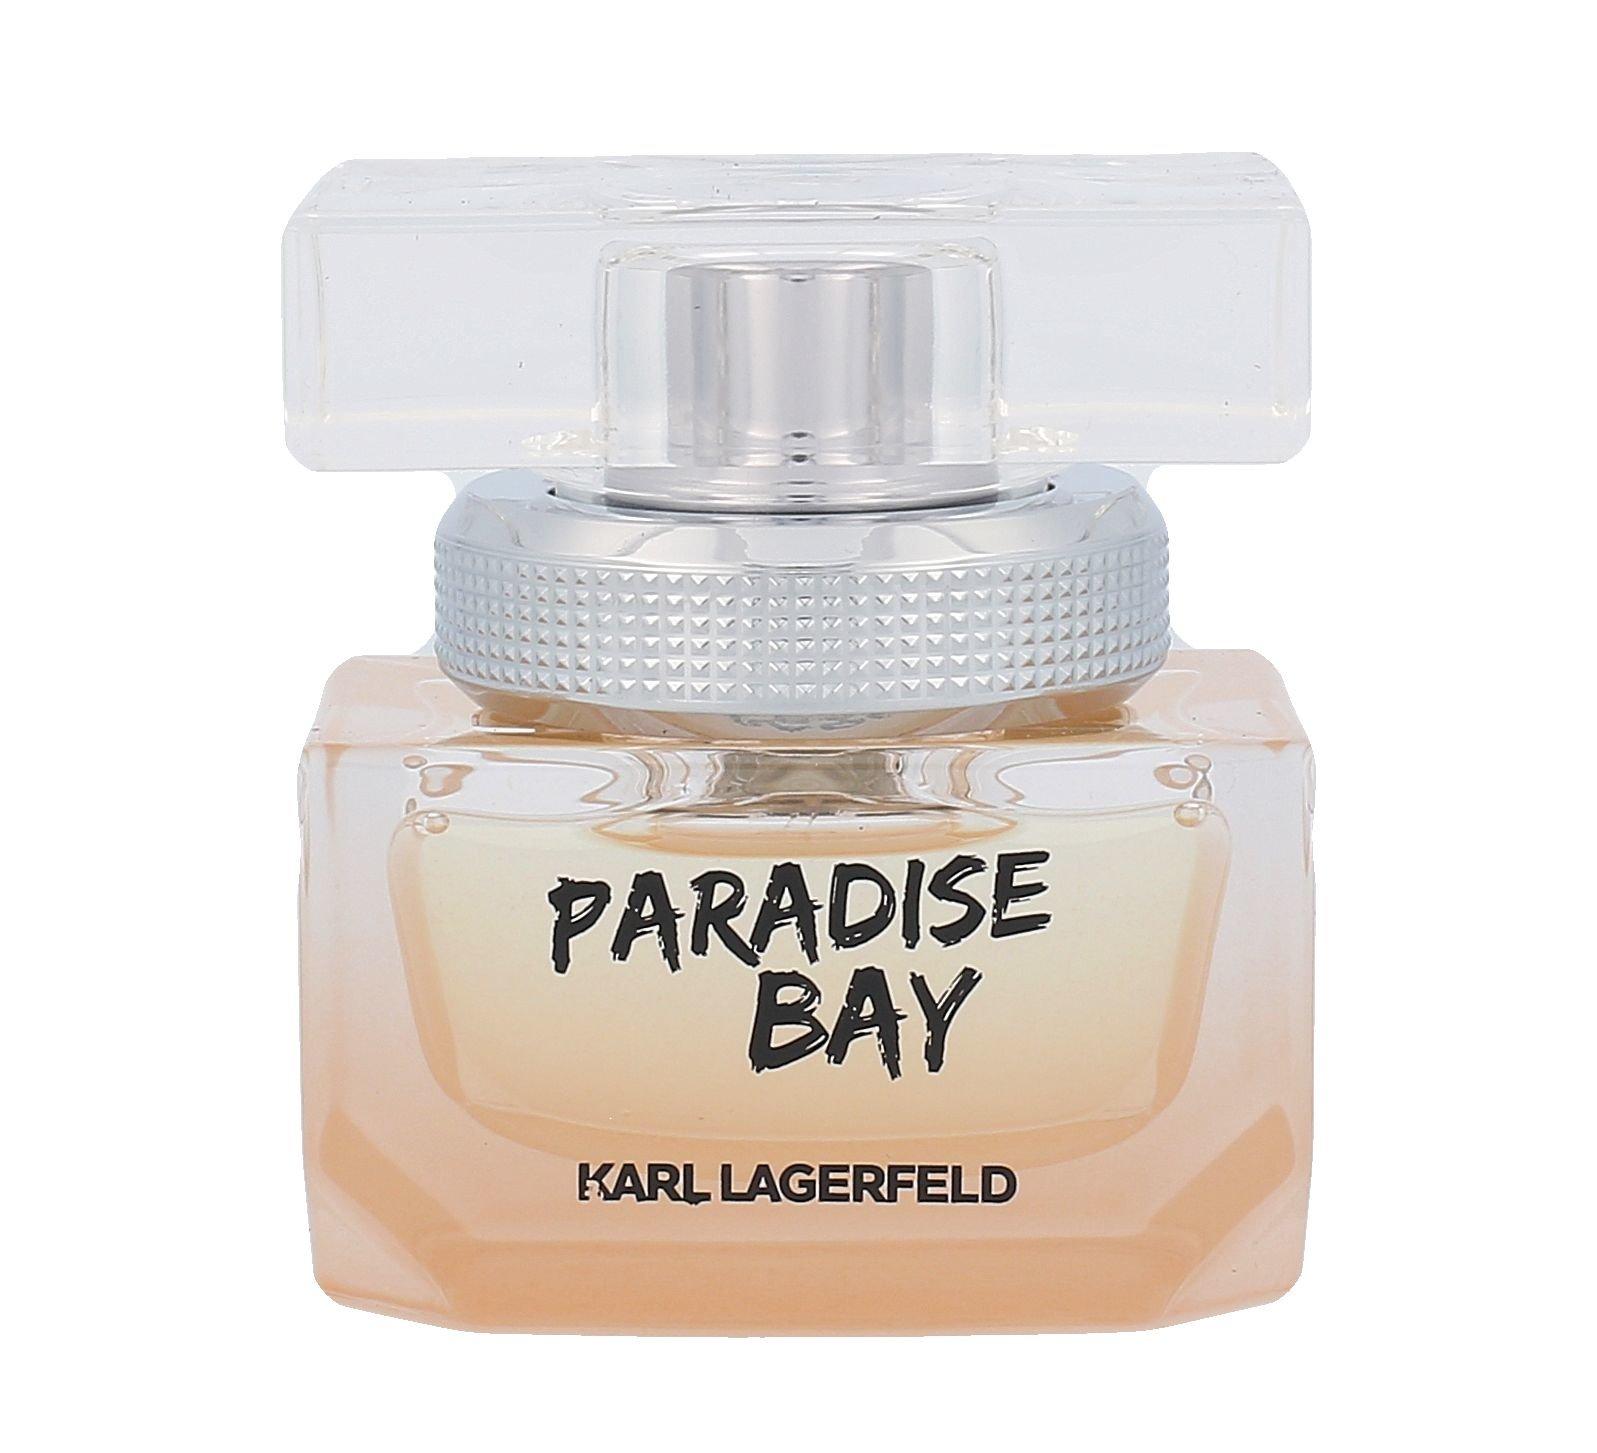 Karl Lagerfeld Karl Lagerfeld Paradise Bay EDP 25ml